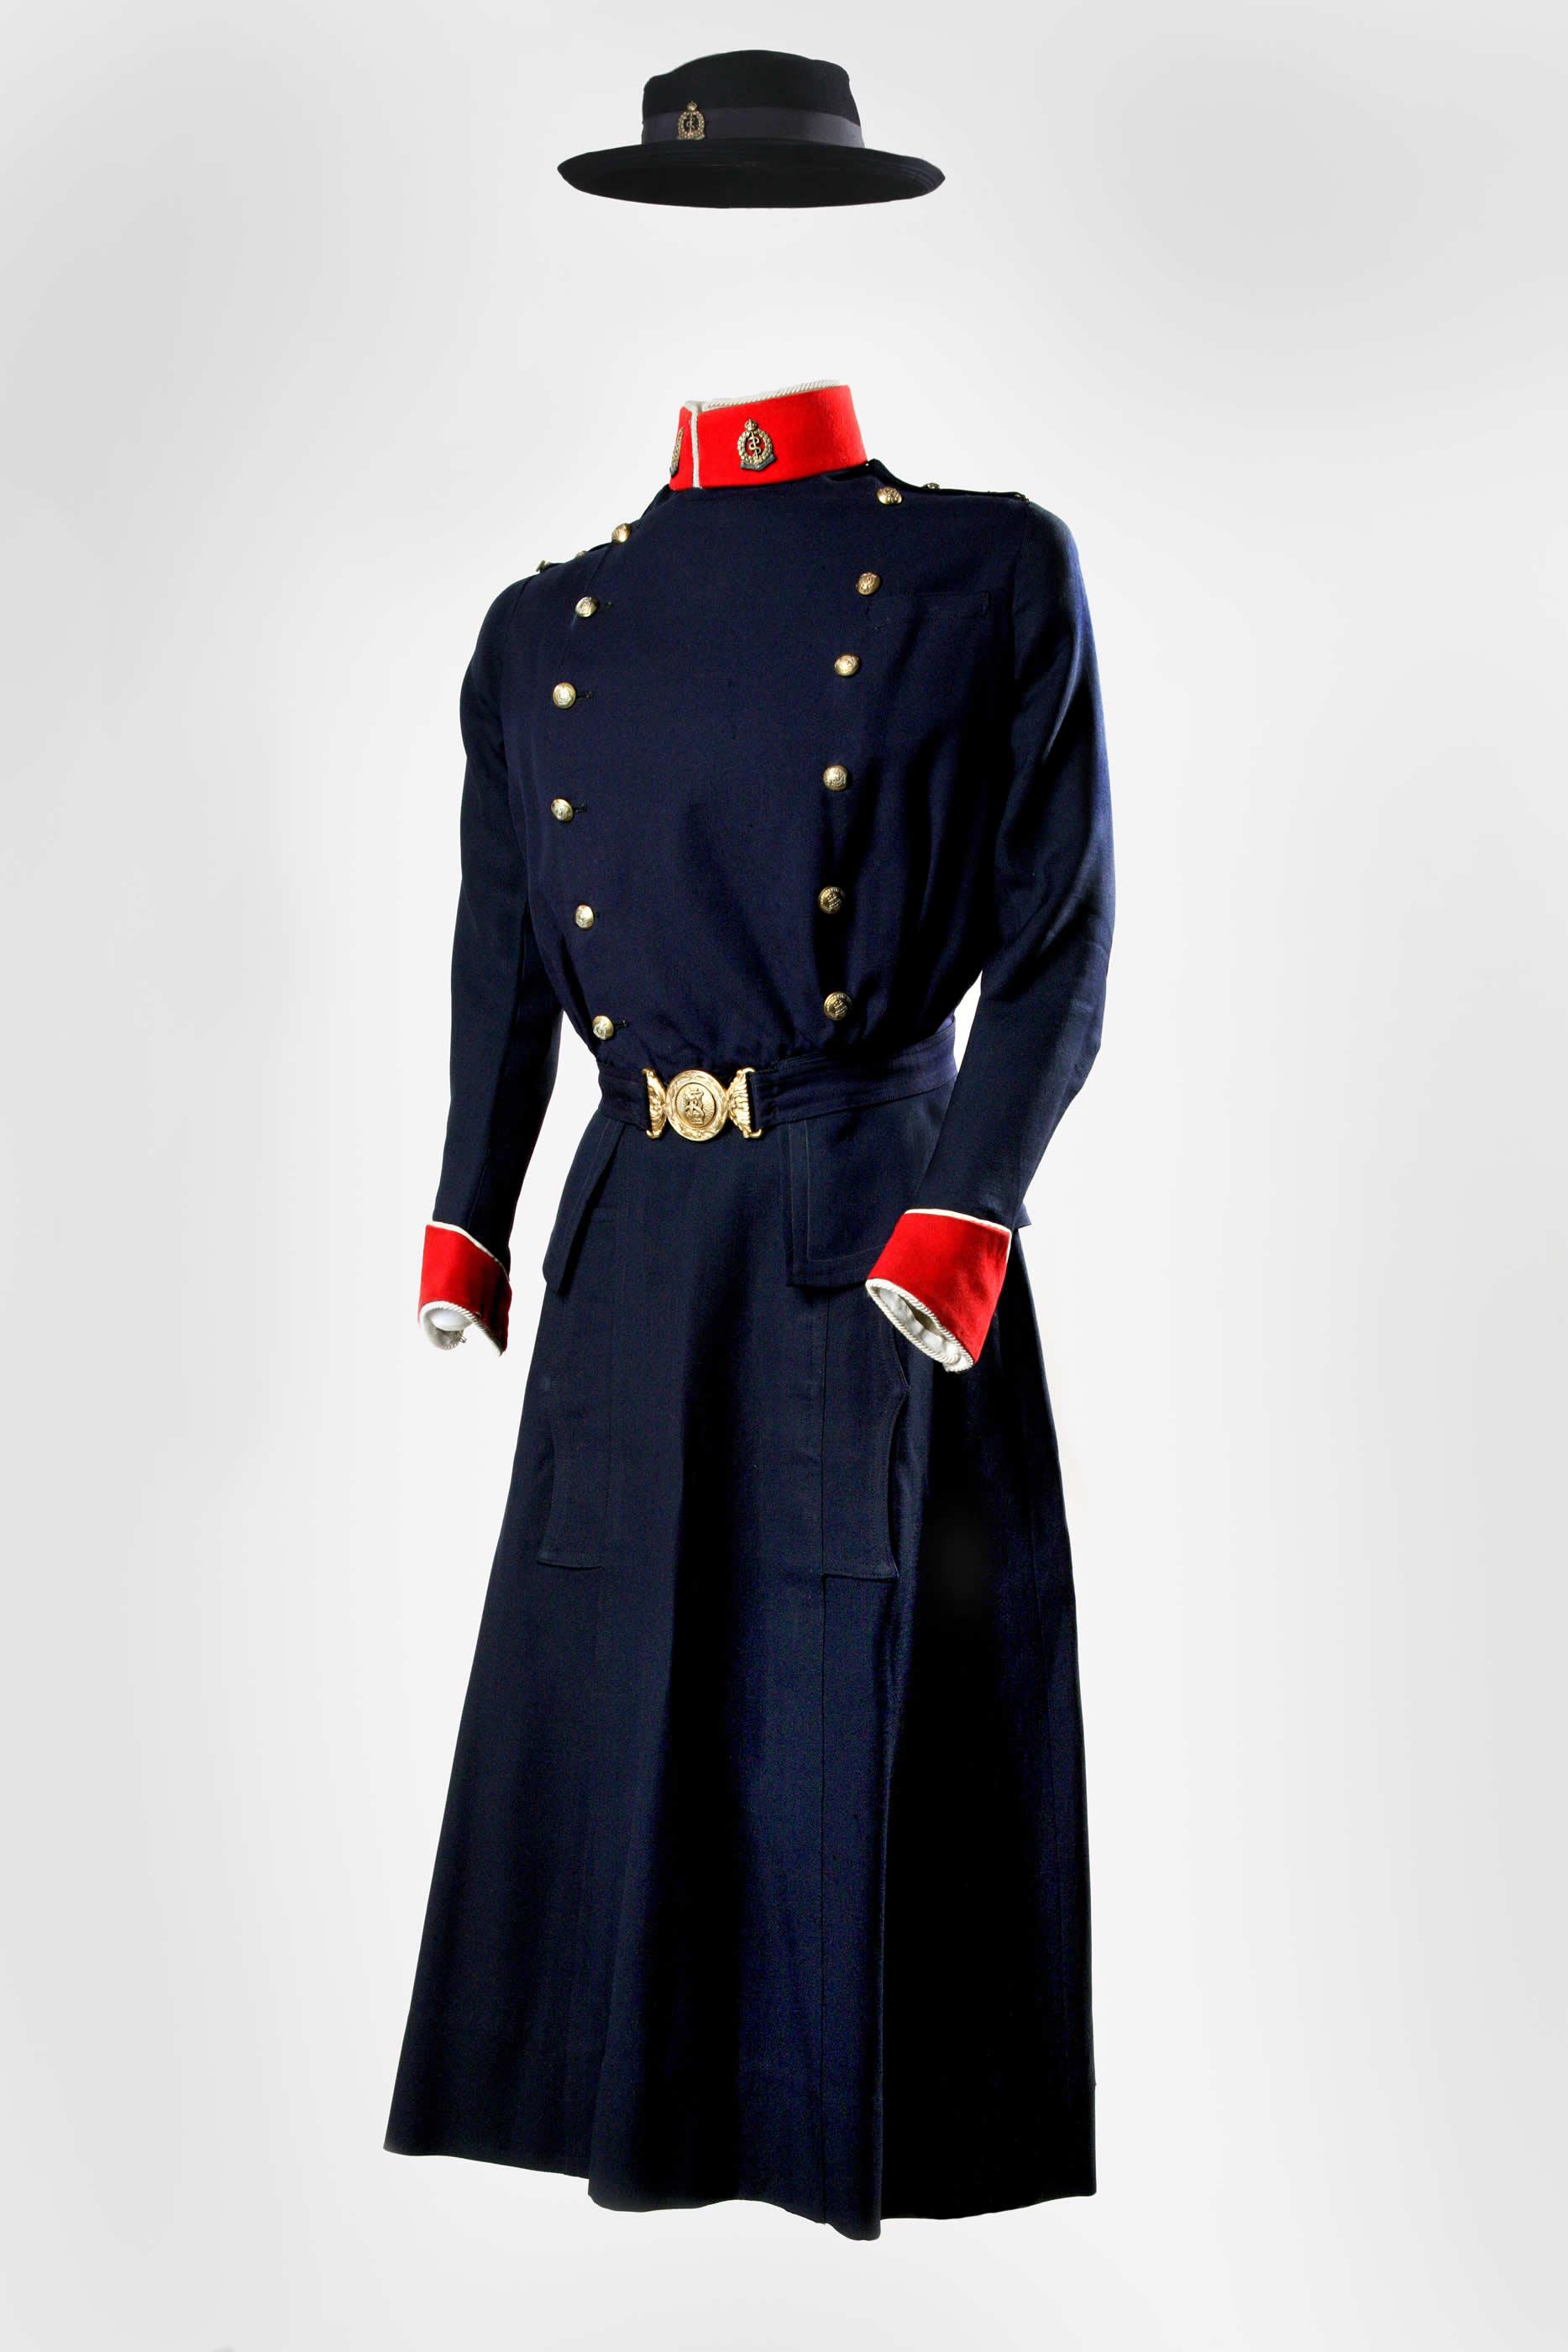 Nursing Dress Uniform